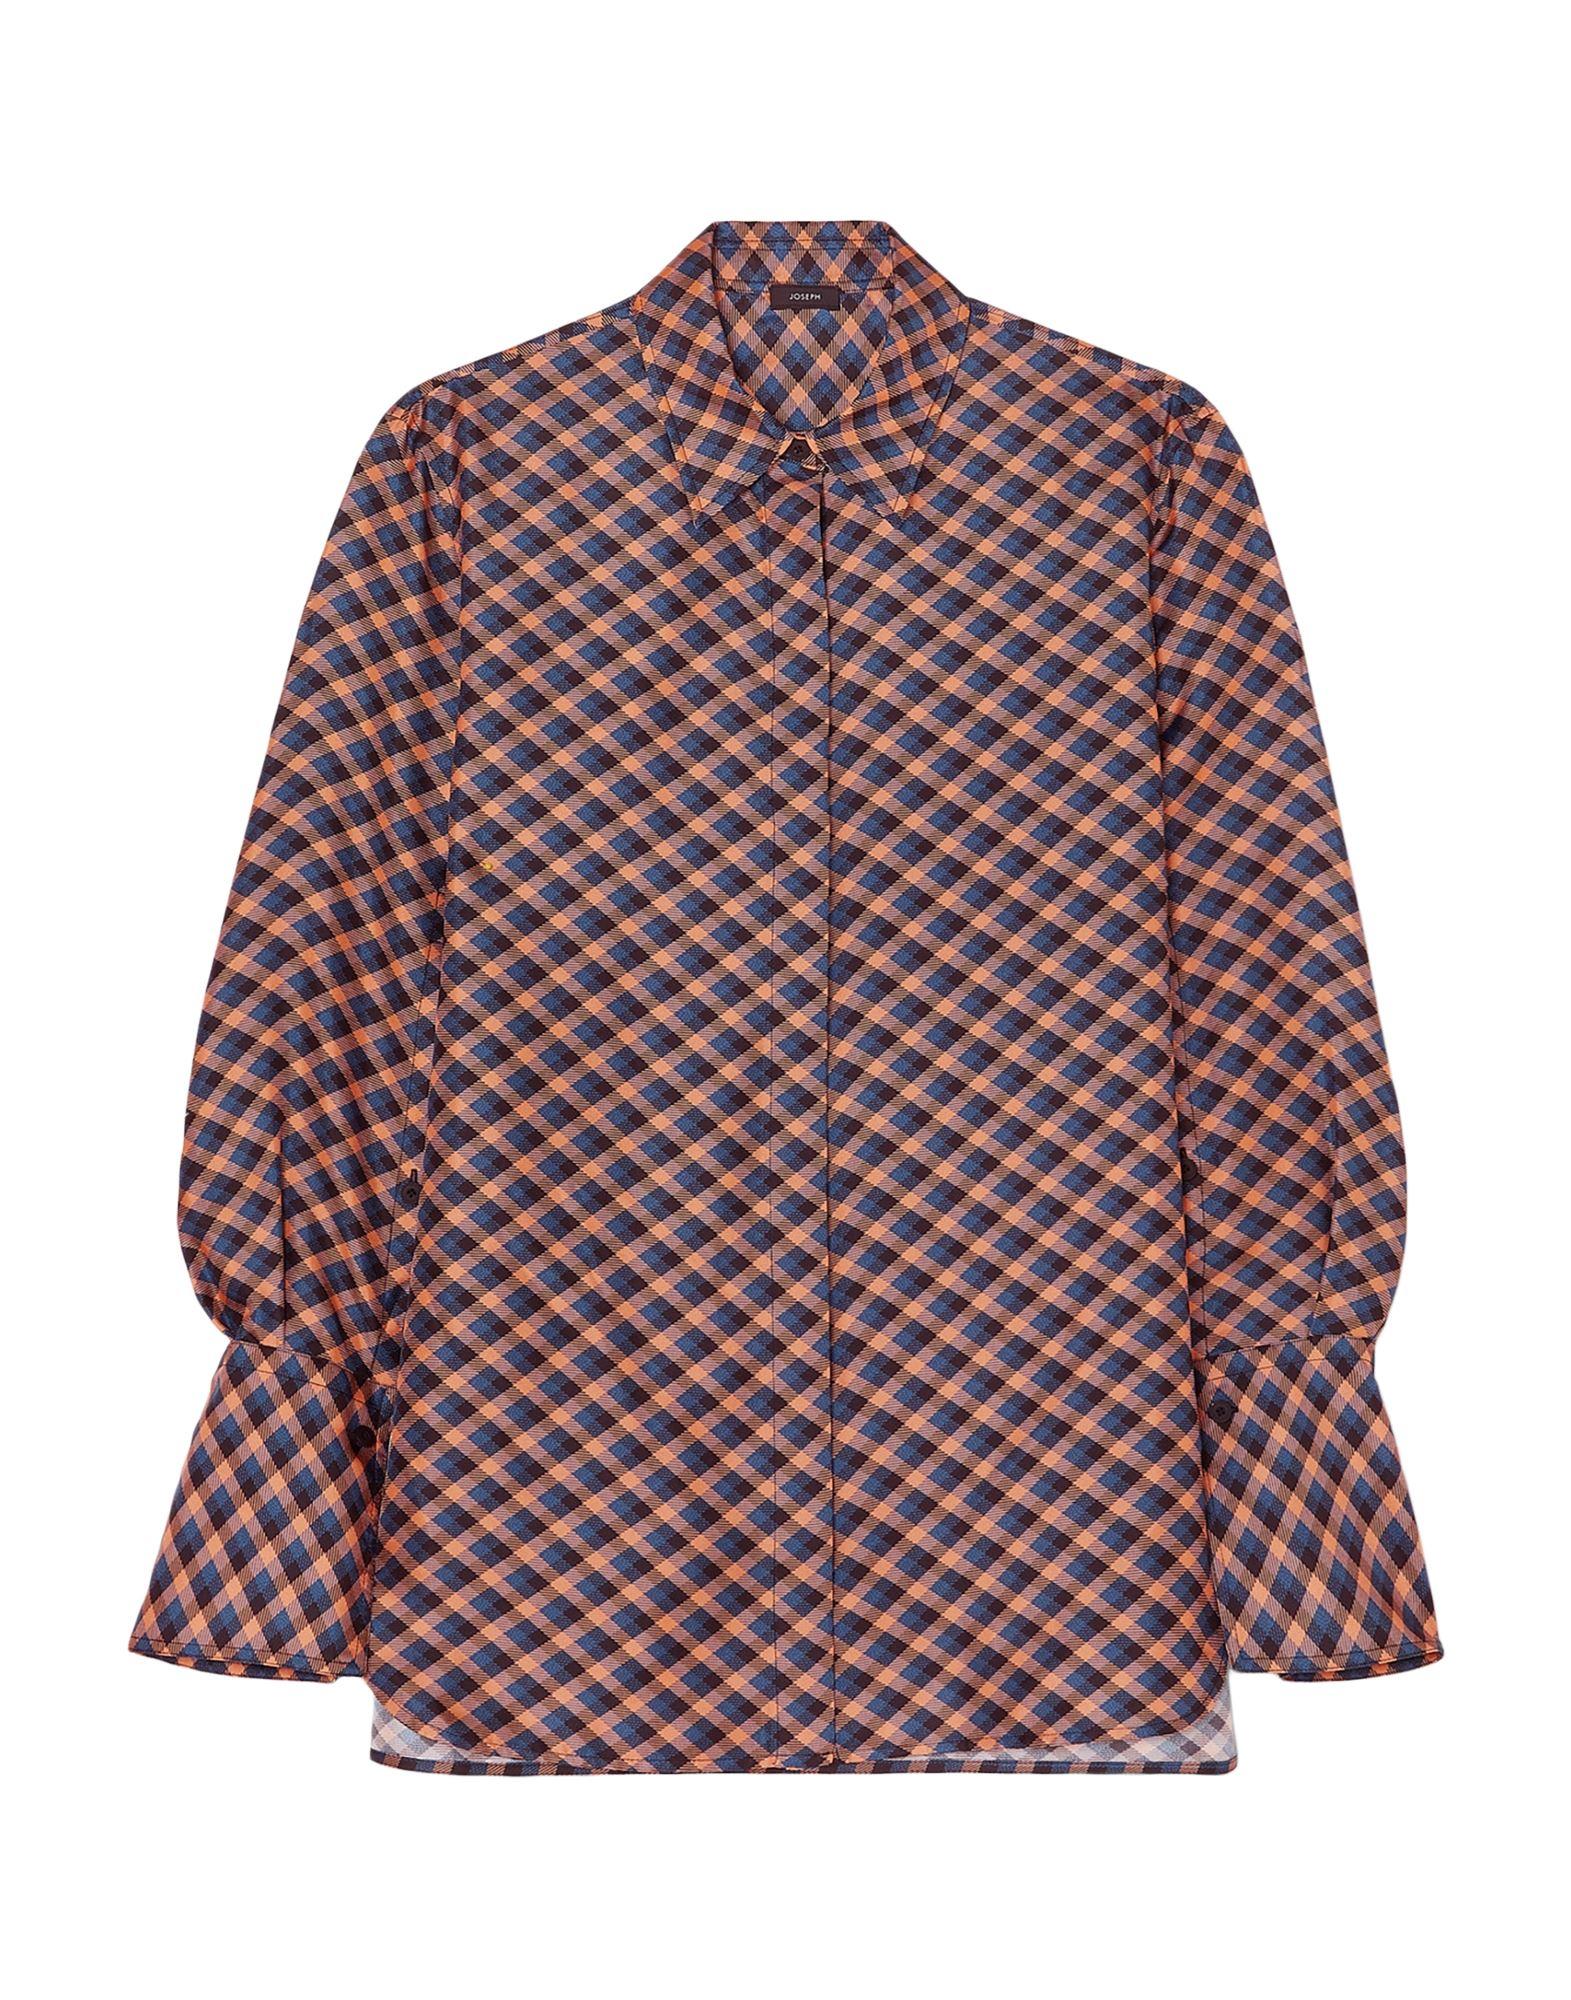 JOSEPH Shirts - Item 38878818